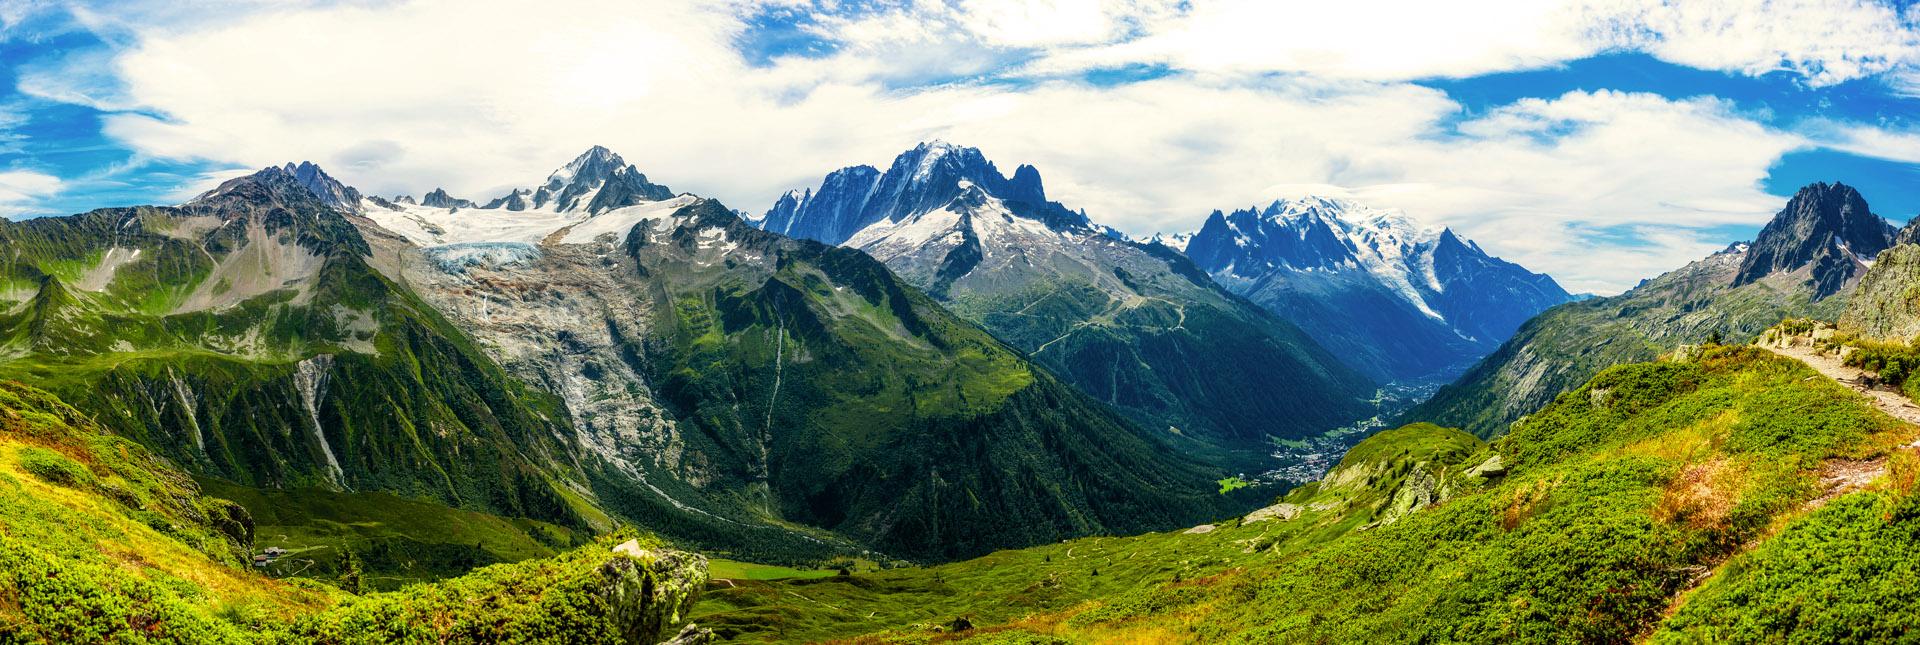 panoramic view during the trek